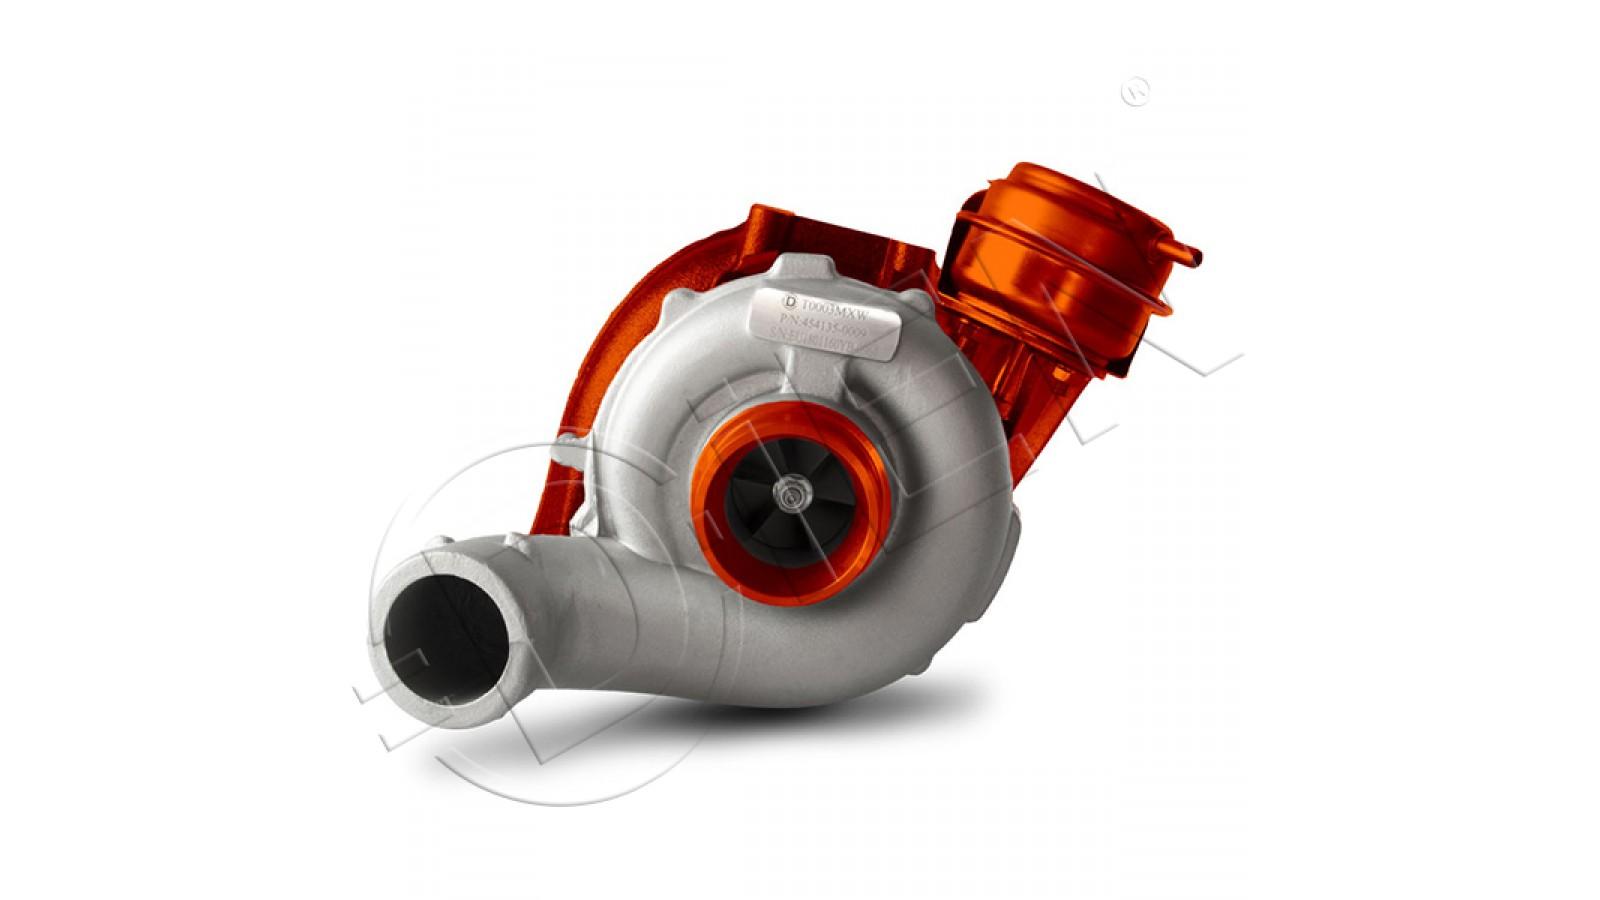 Turbocompressore rigenerato per MAN TGA 28.350, 28.360 FNLC, FNLLC, FNLRC, FNLL-LE, FNLLR-LE 350Cv